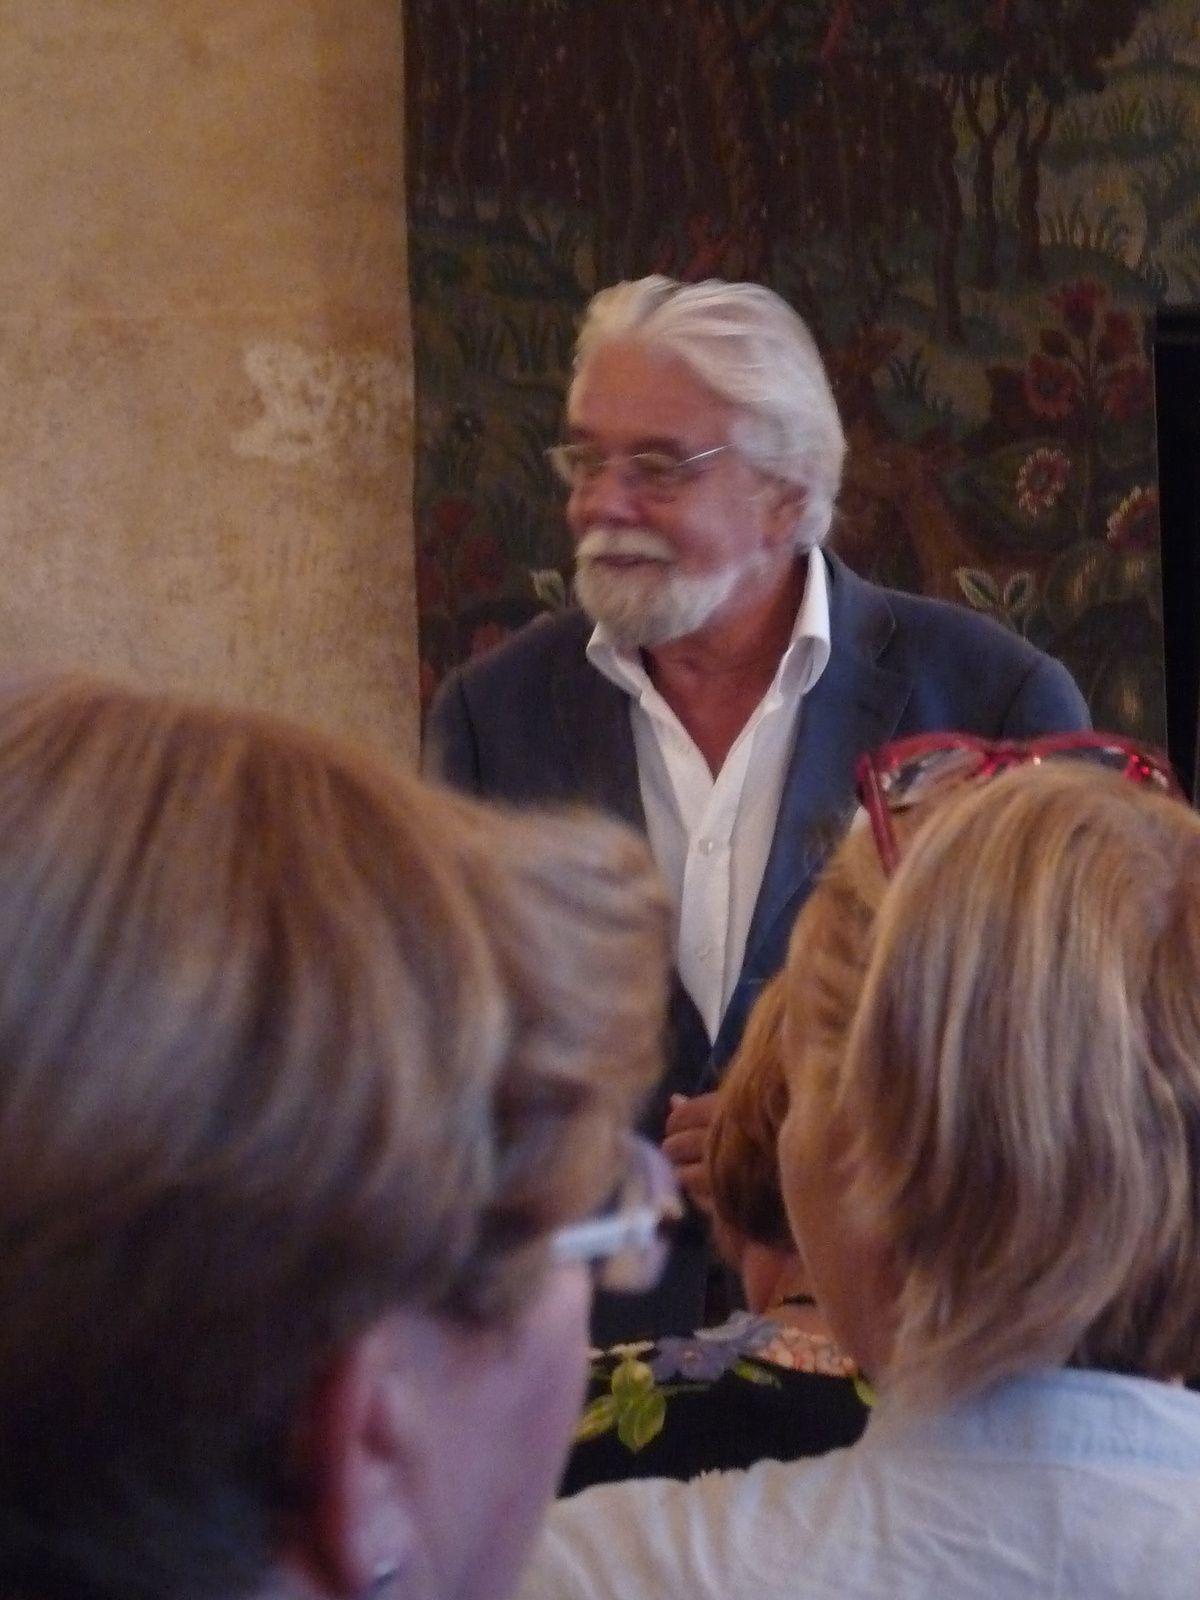 Dernier concert: Tom van der Bruggen ouvre la soirée.